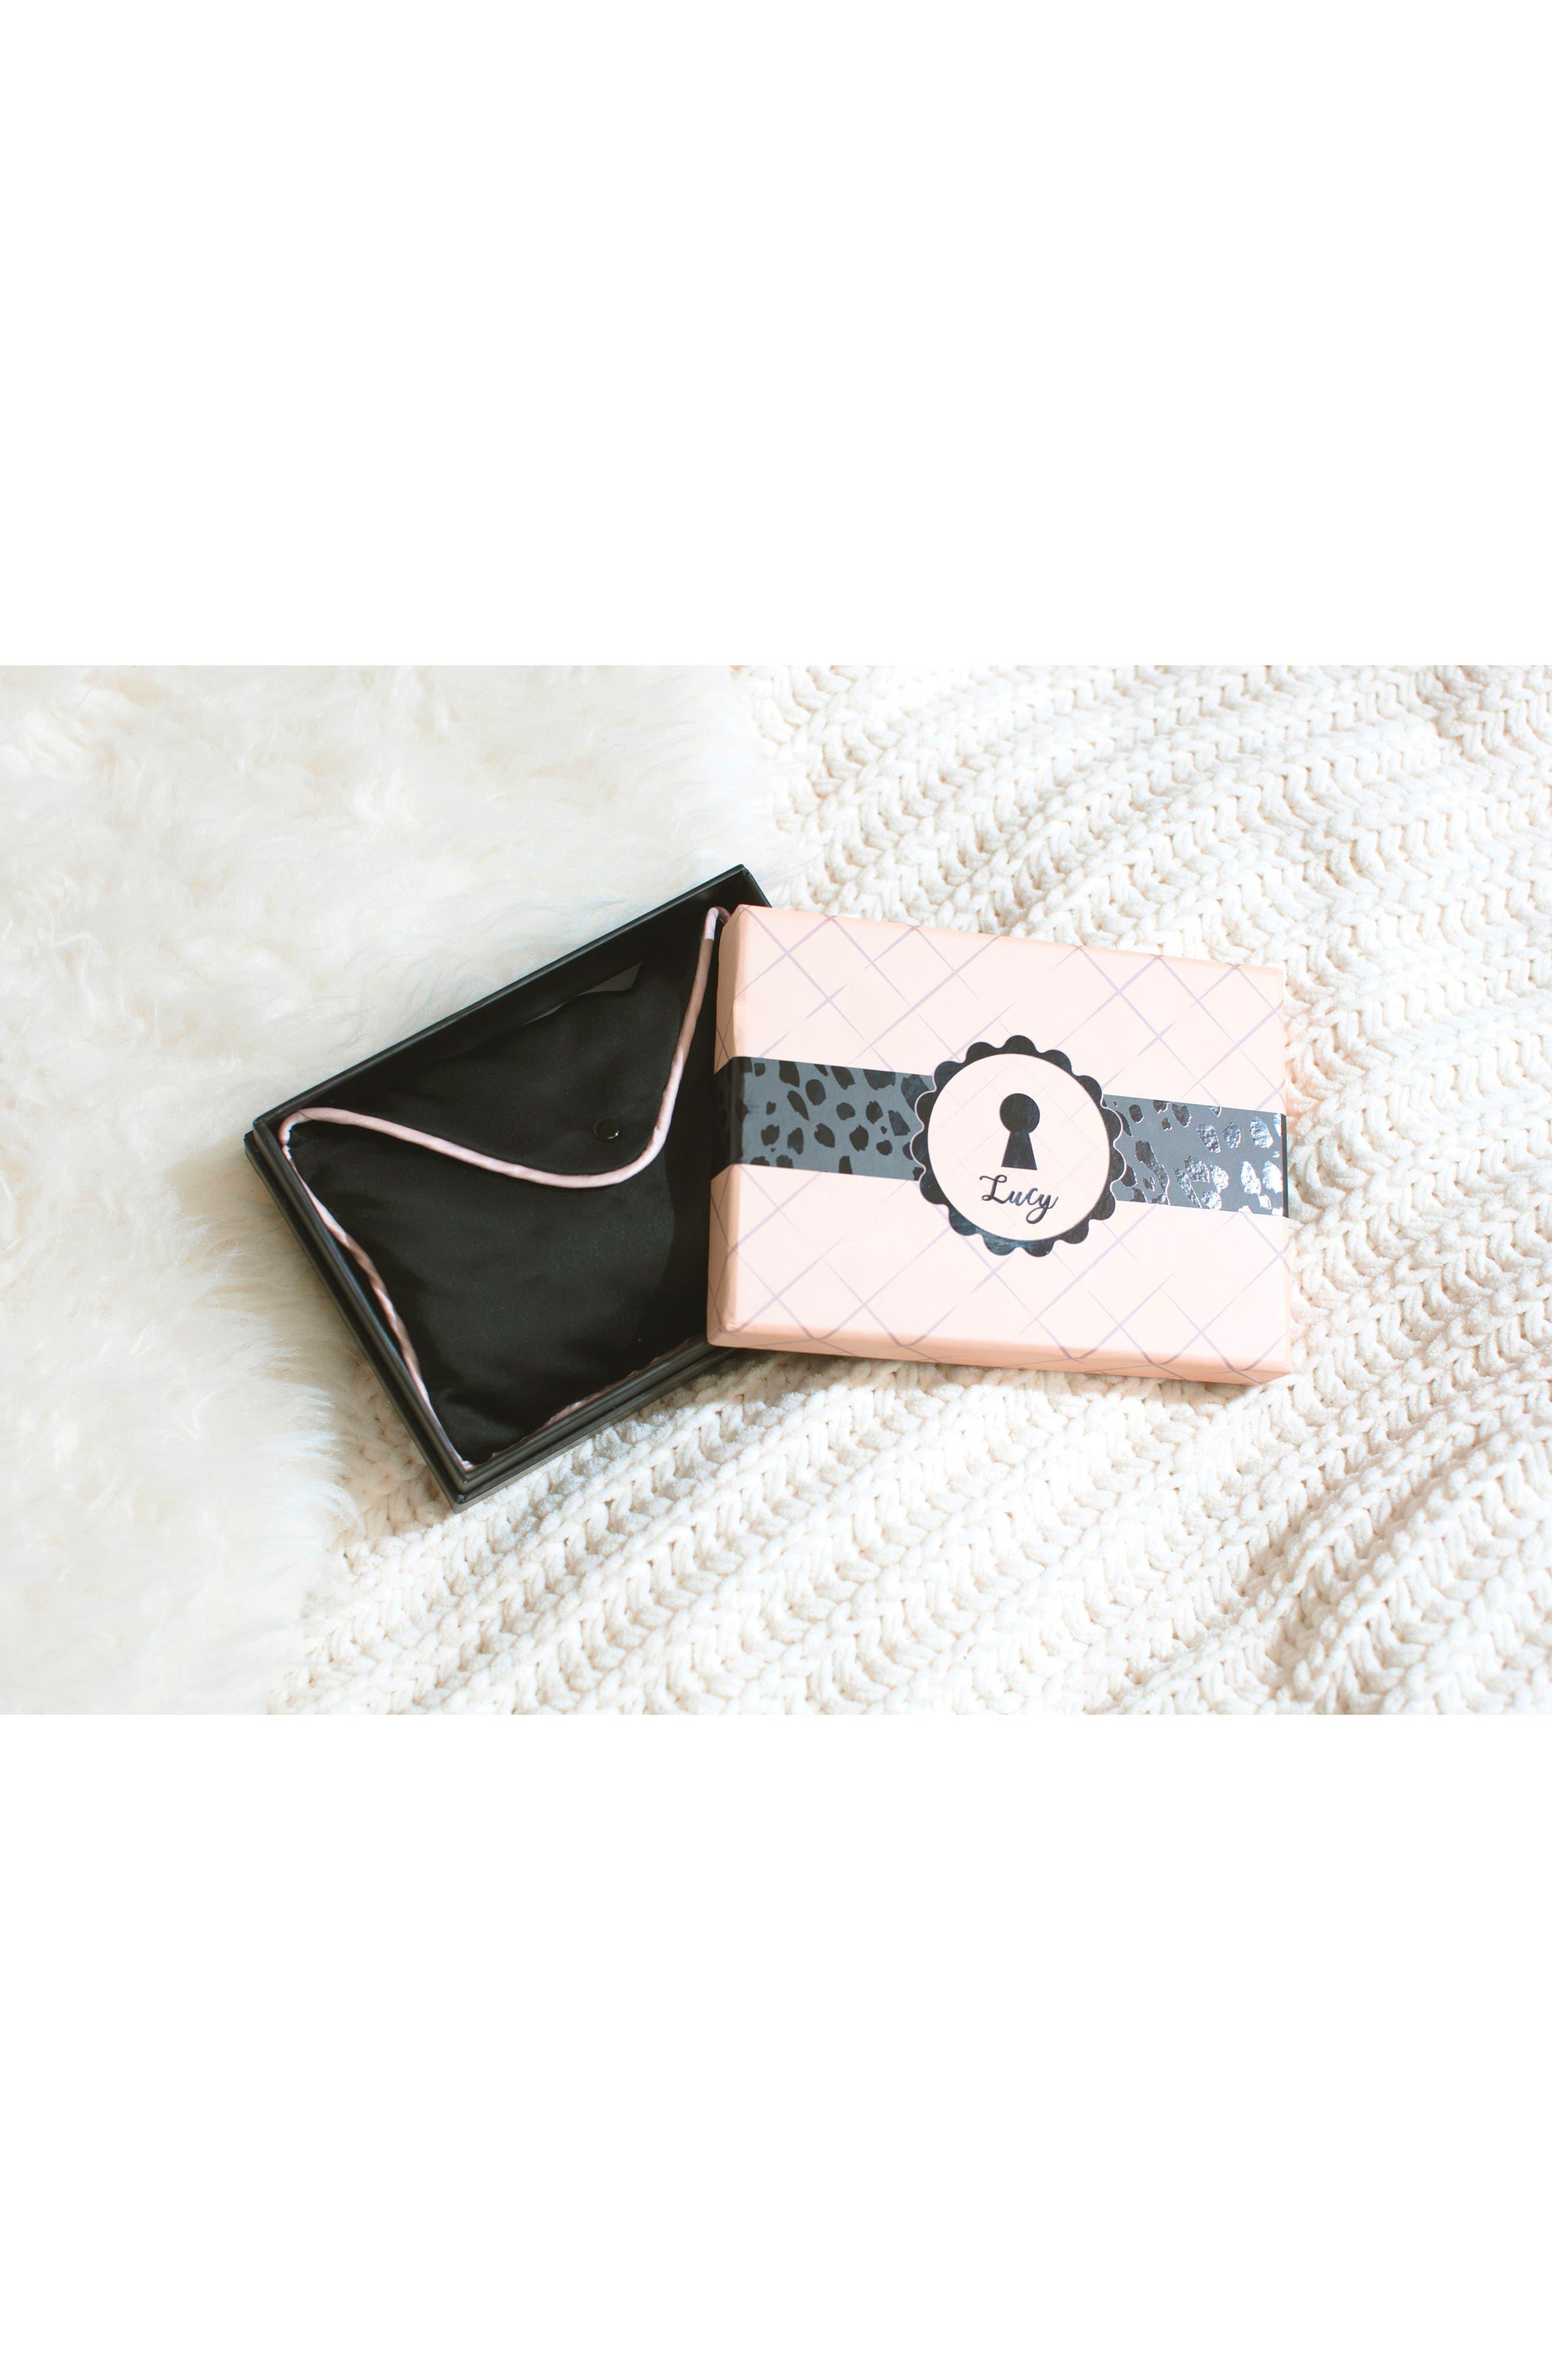 Lucy Bralette & Panties Gift Box,                             Alternate thumbnail 6, color,                             BLACK